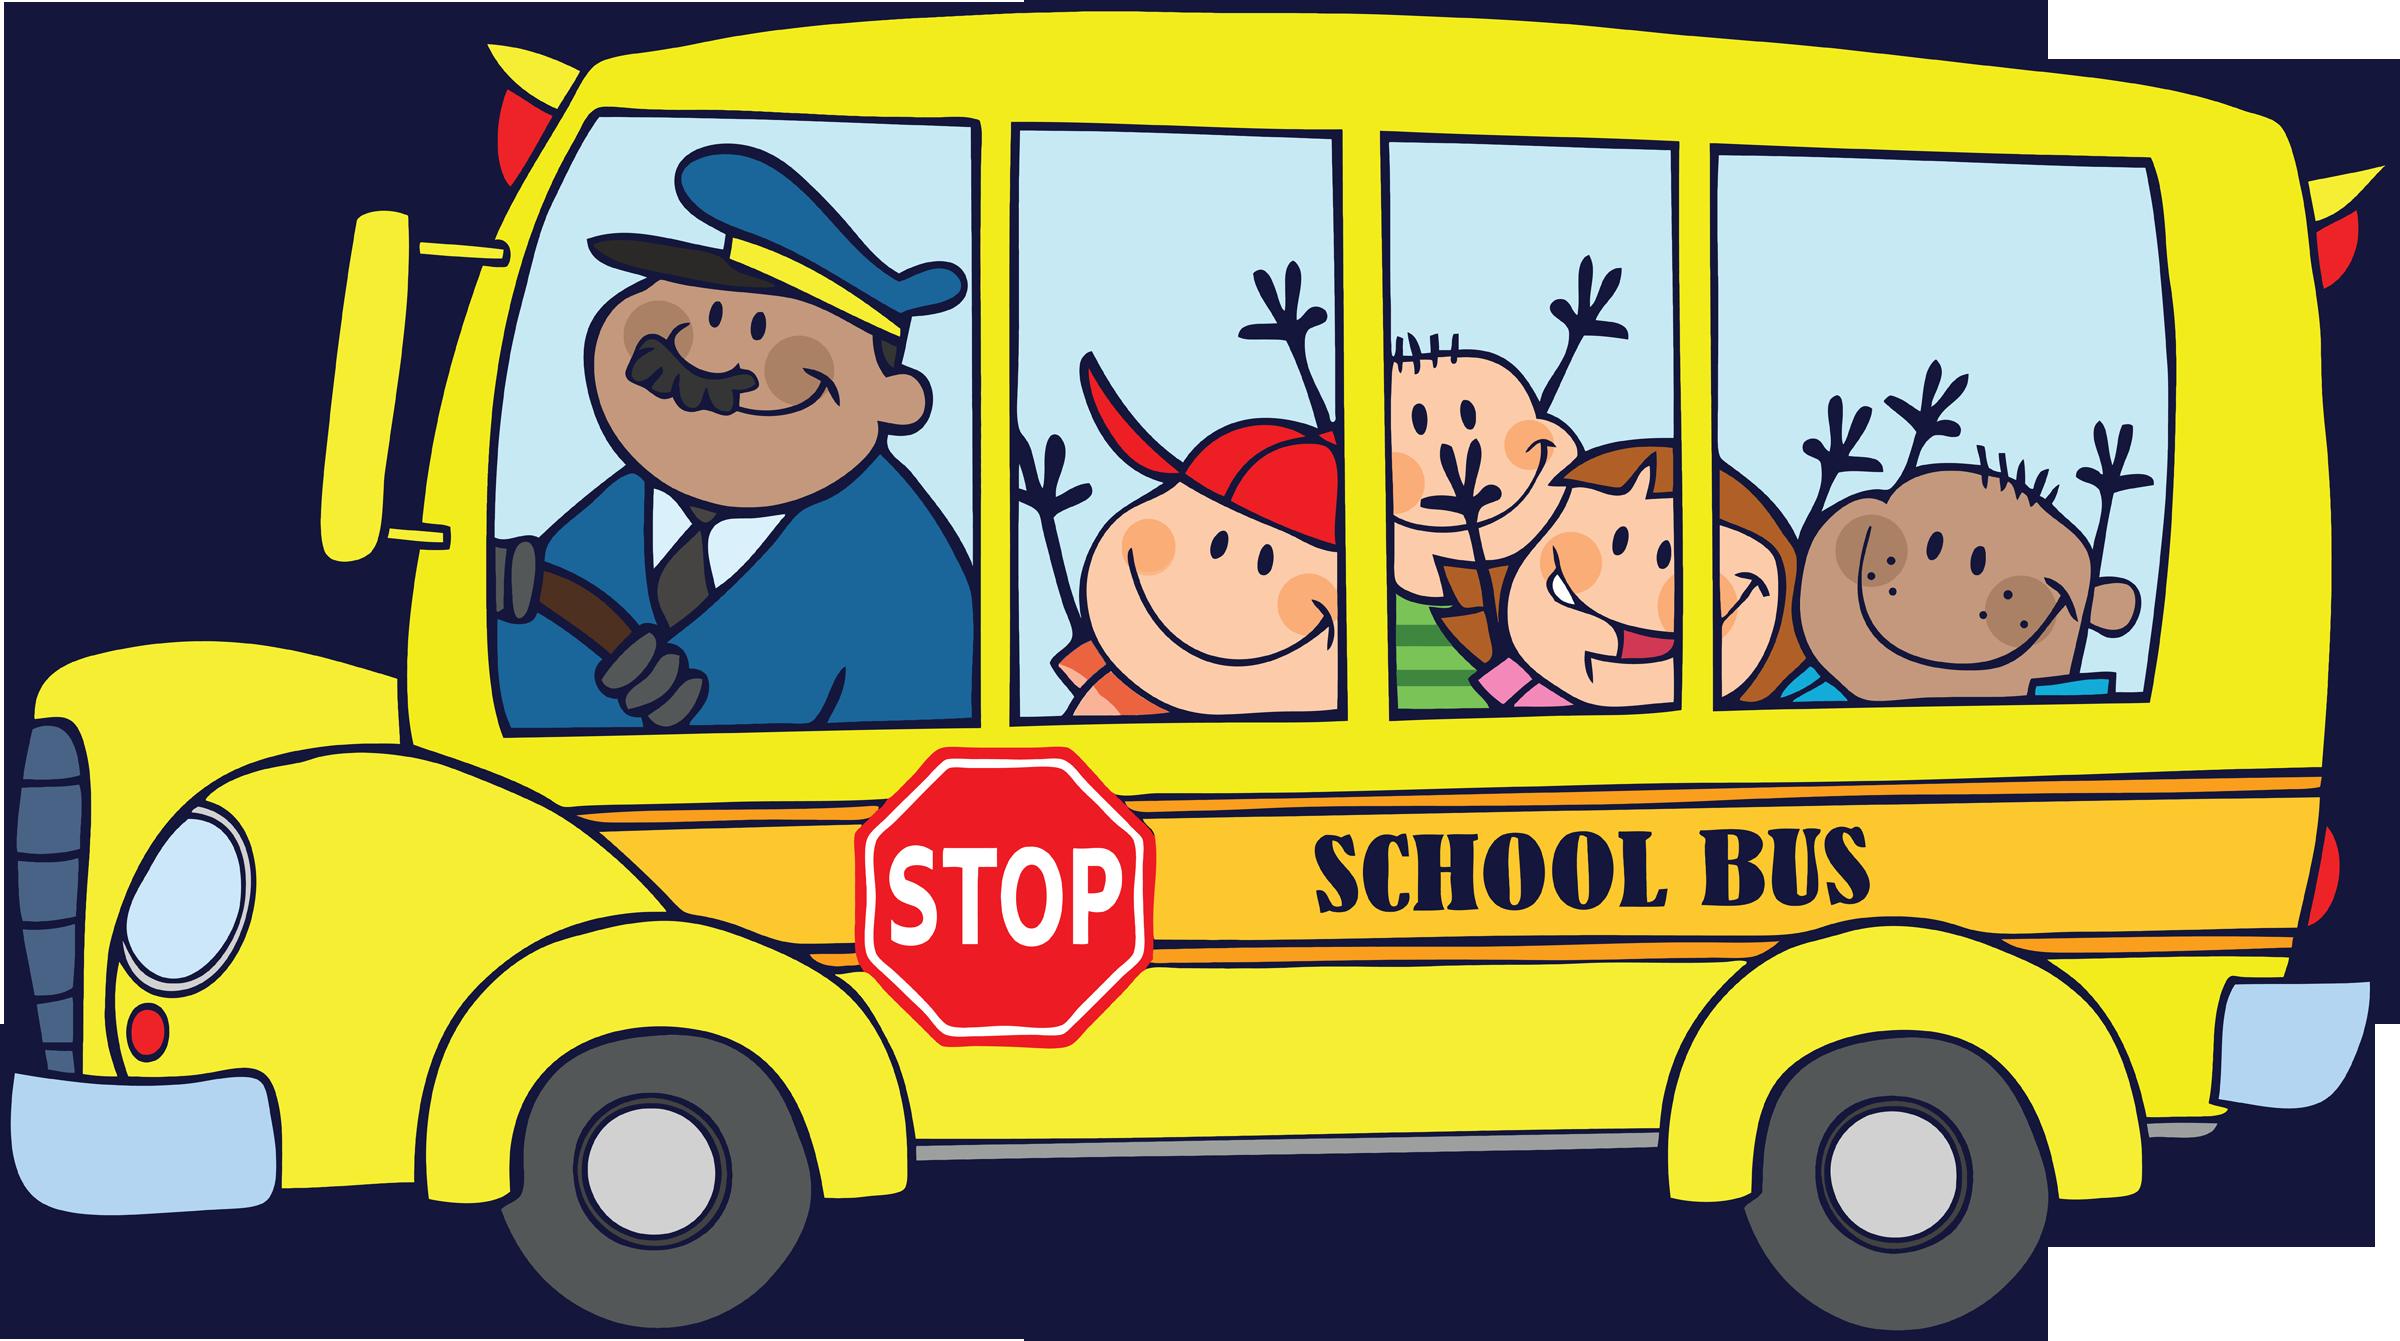 School playground clipart banner freeuse Schoolbus clip art - ClipartFest banner freeuse